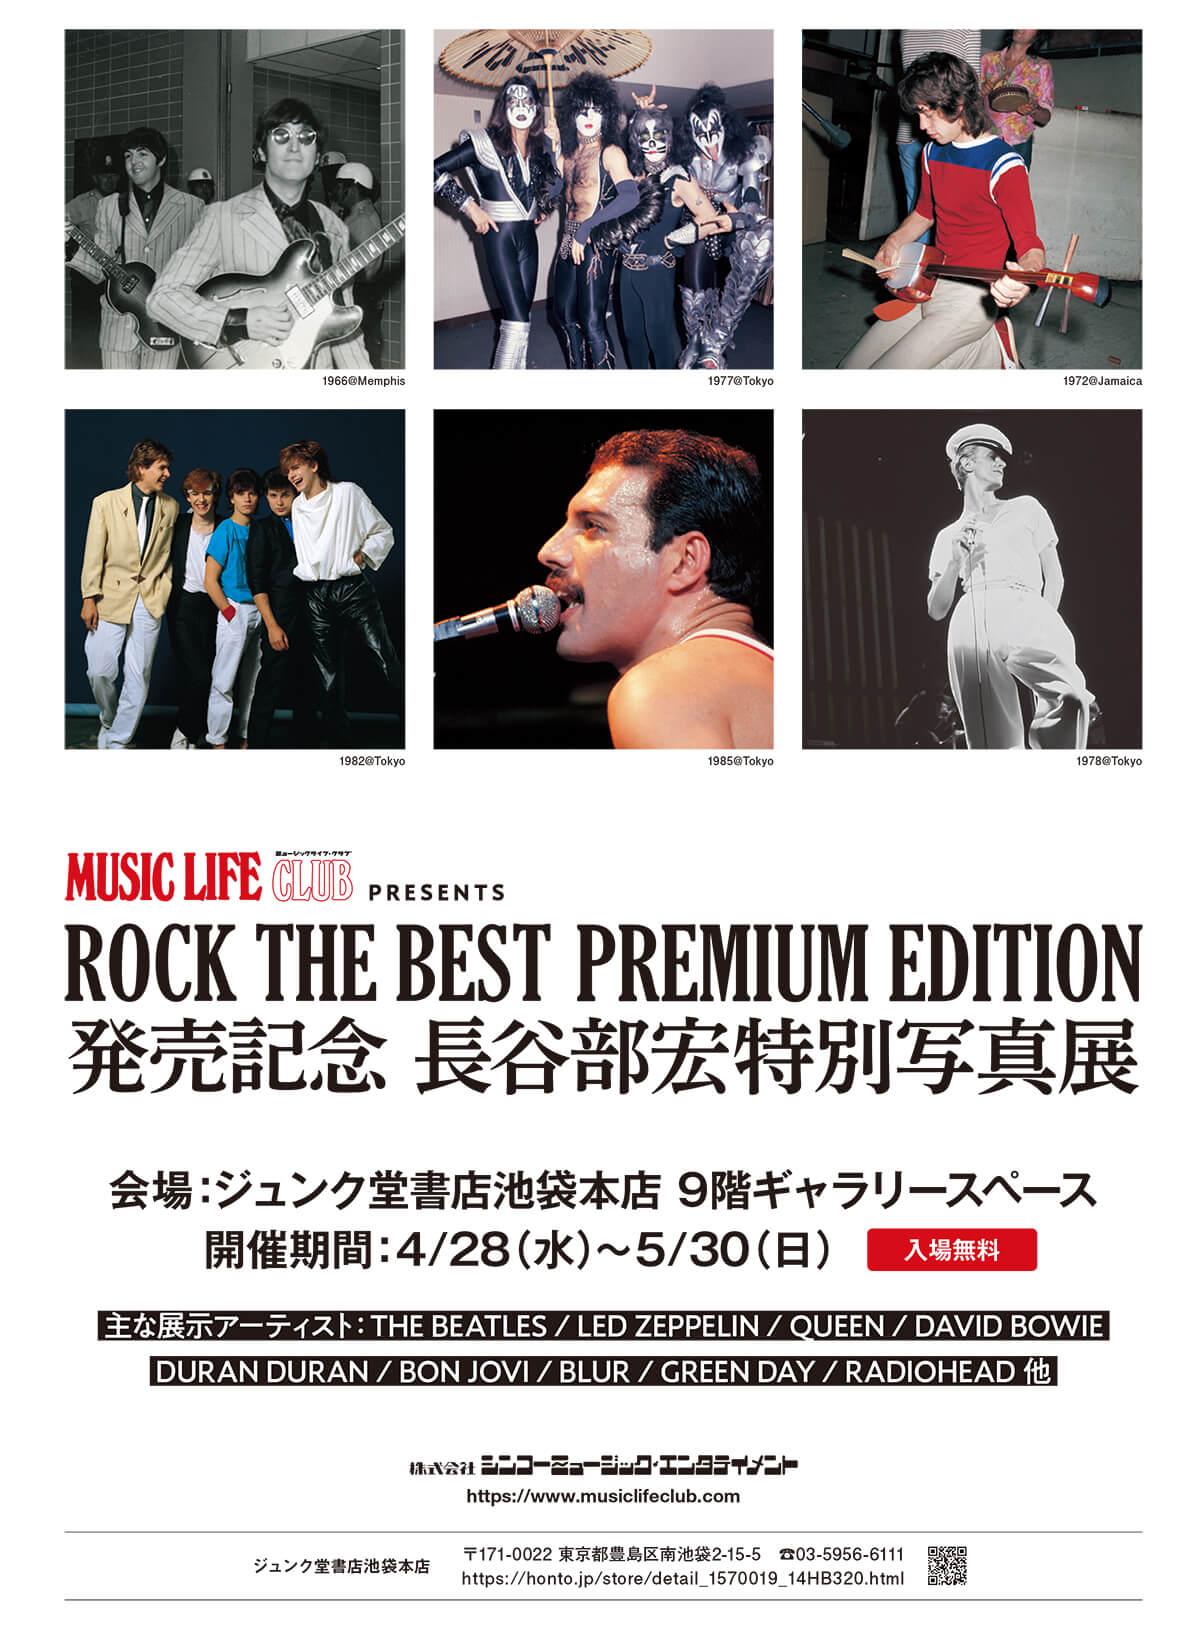 「ROCK THE BEST PREMIUM EDITION 発売記念 長谷部宏特別写真展」ハガキ